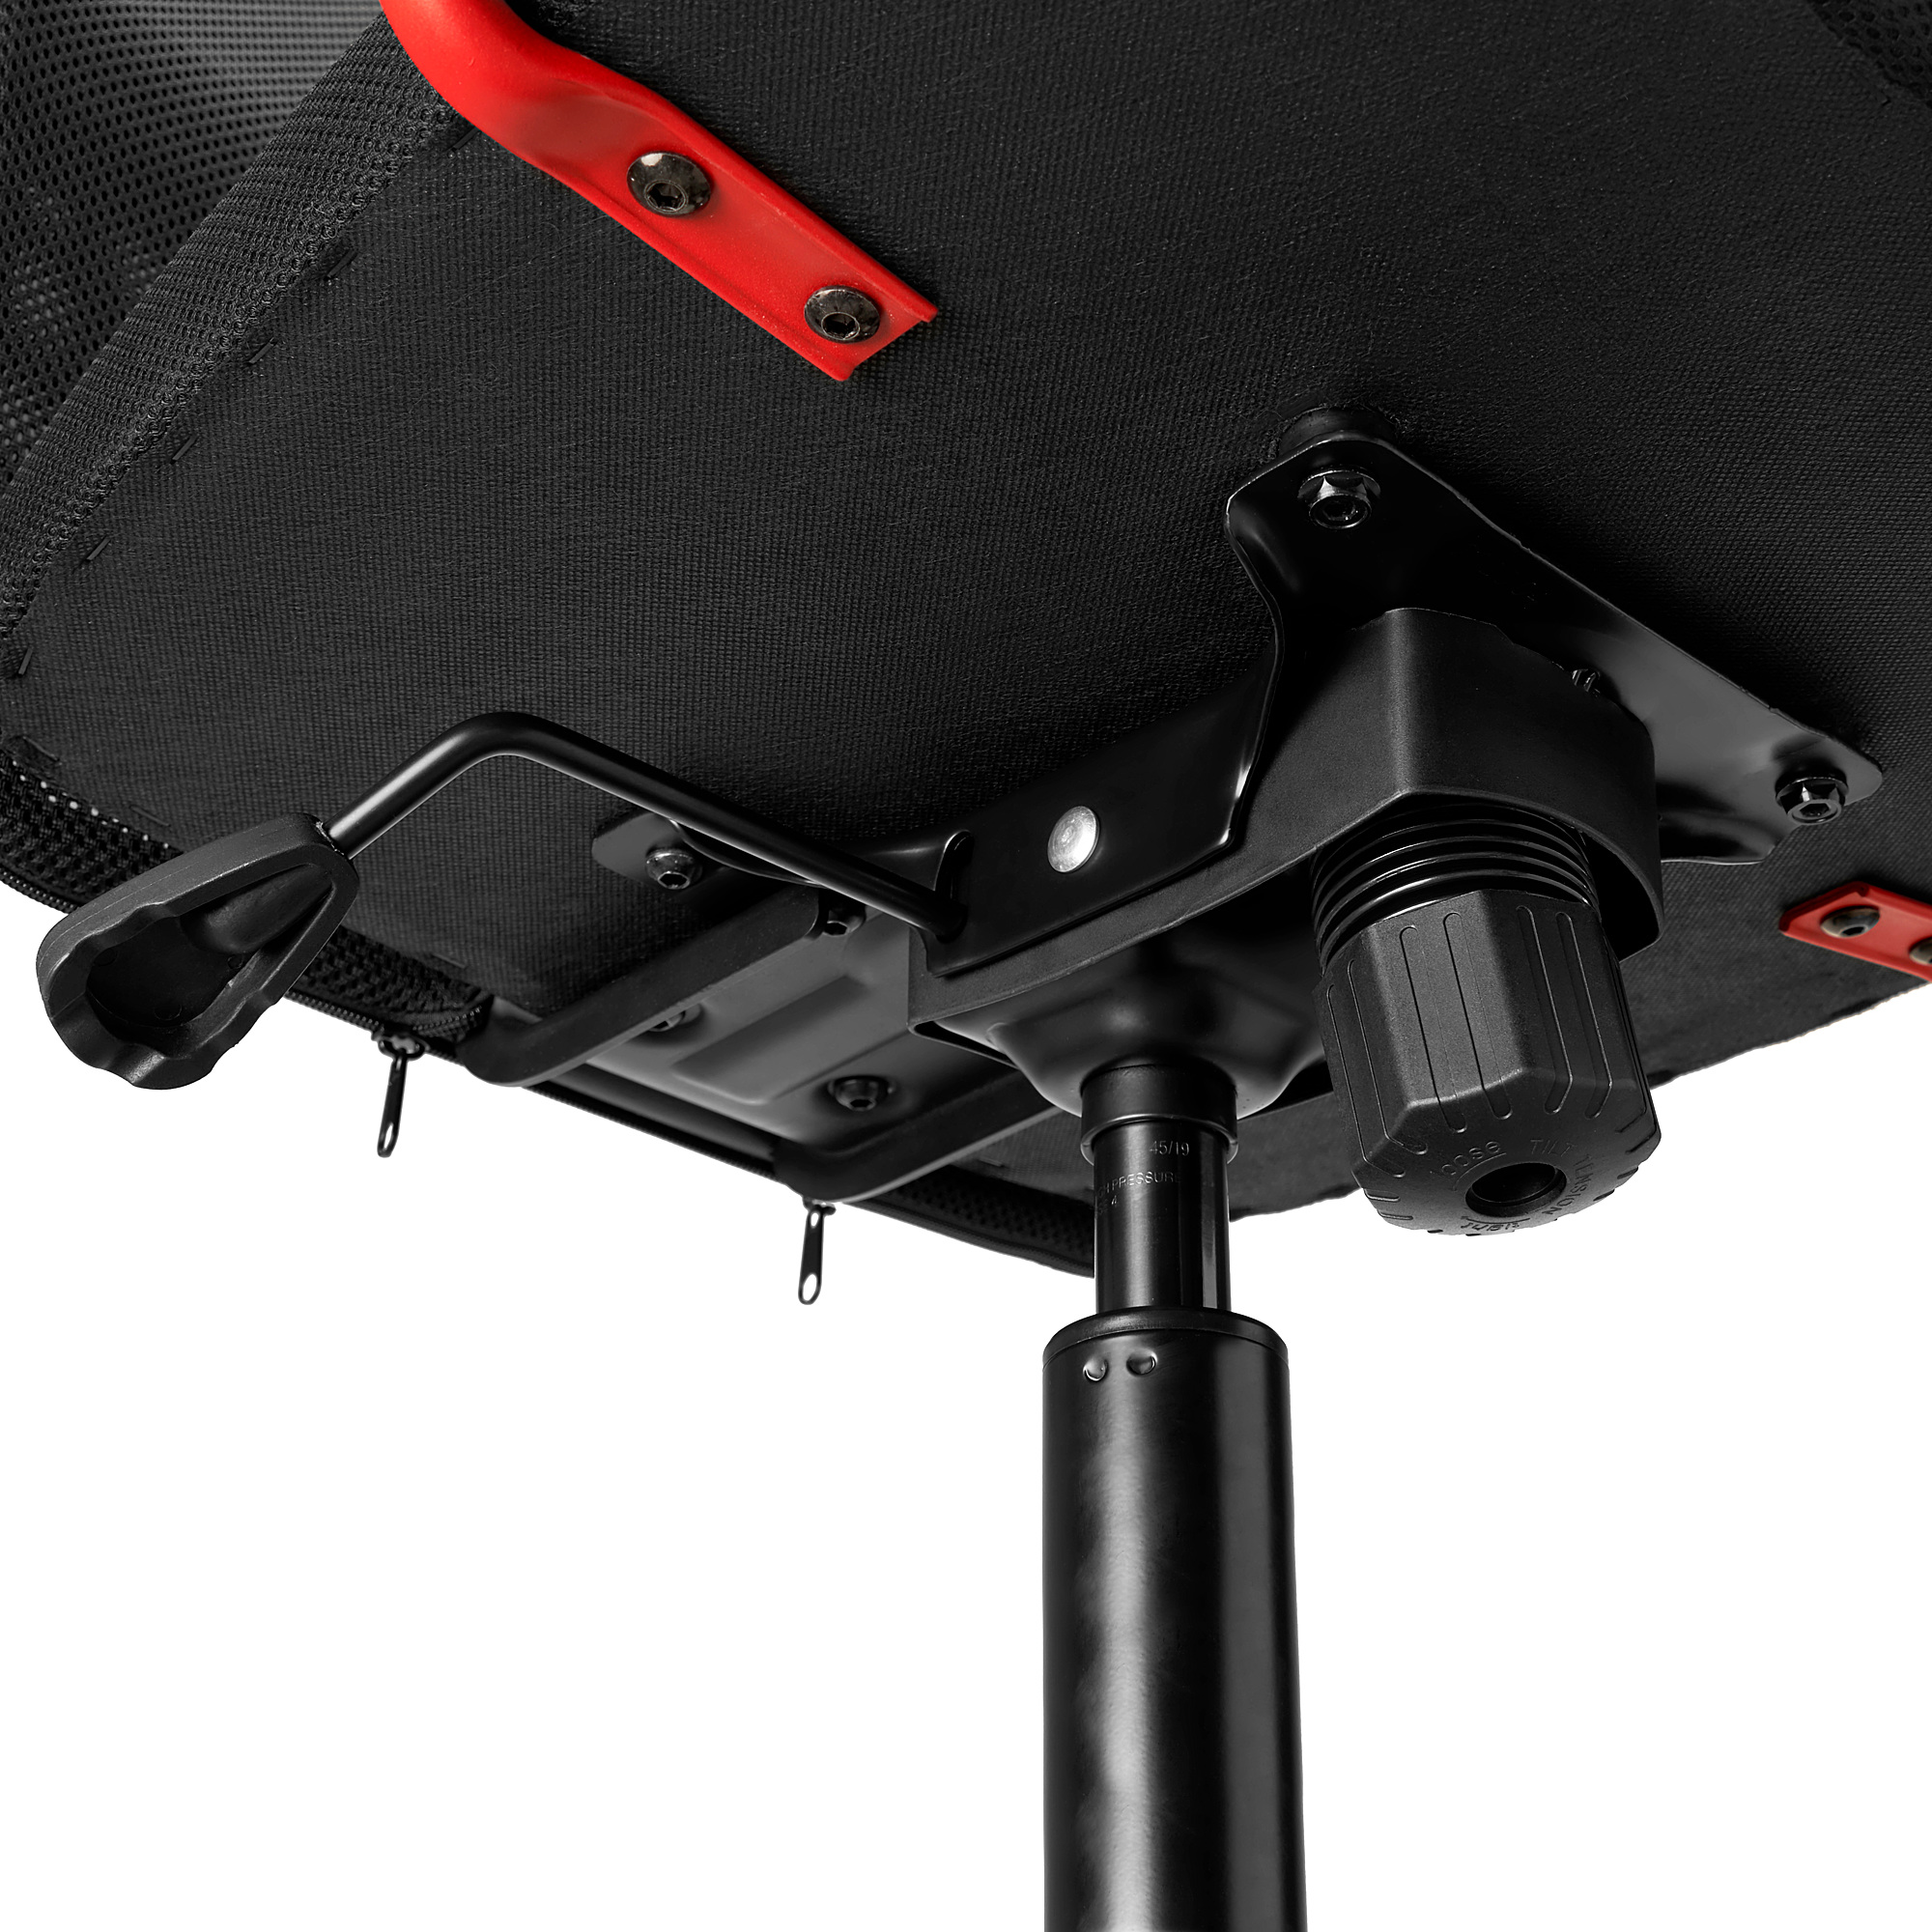 HUVUDSPELARE gaming chair